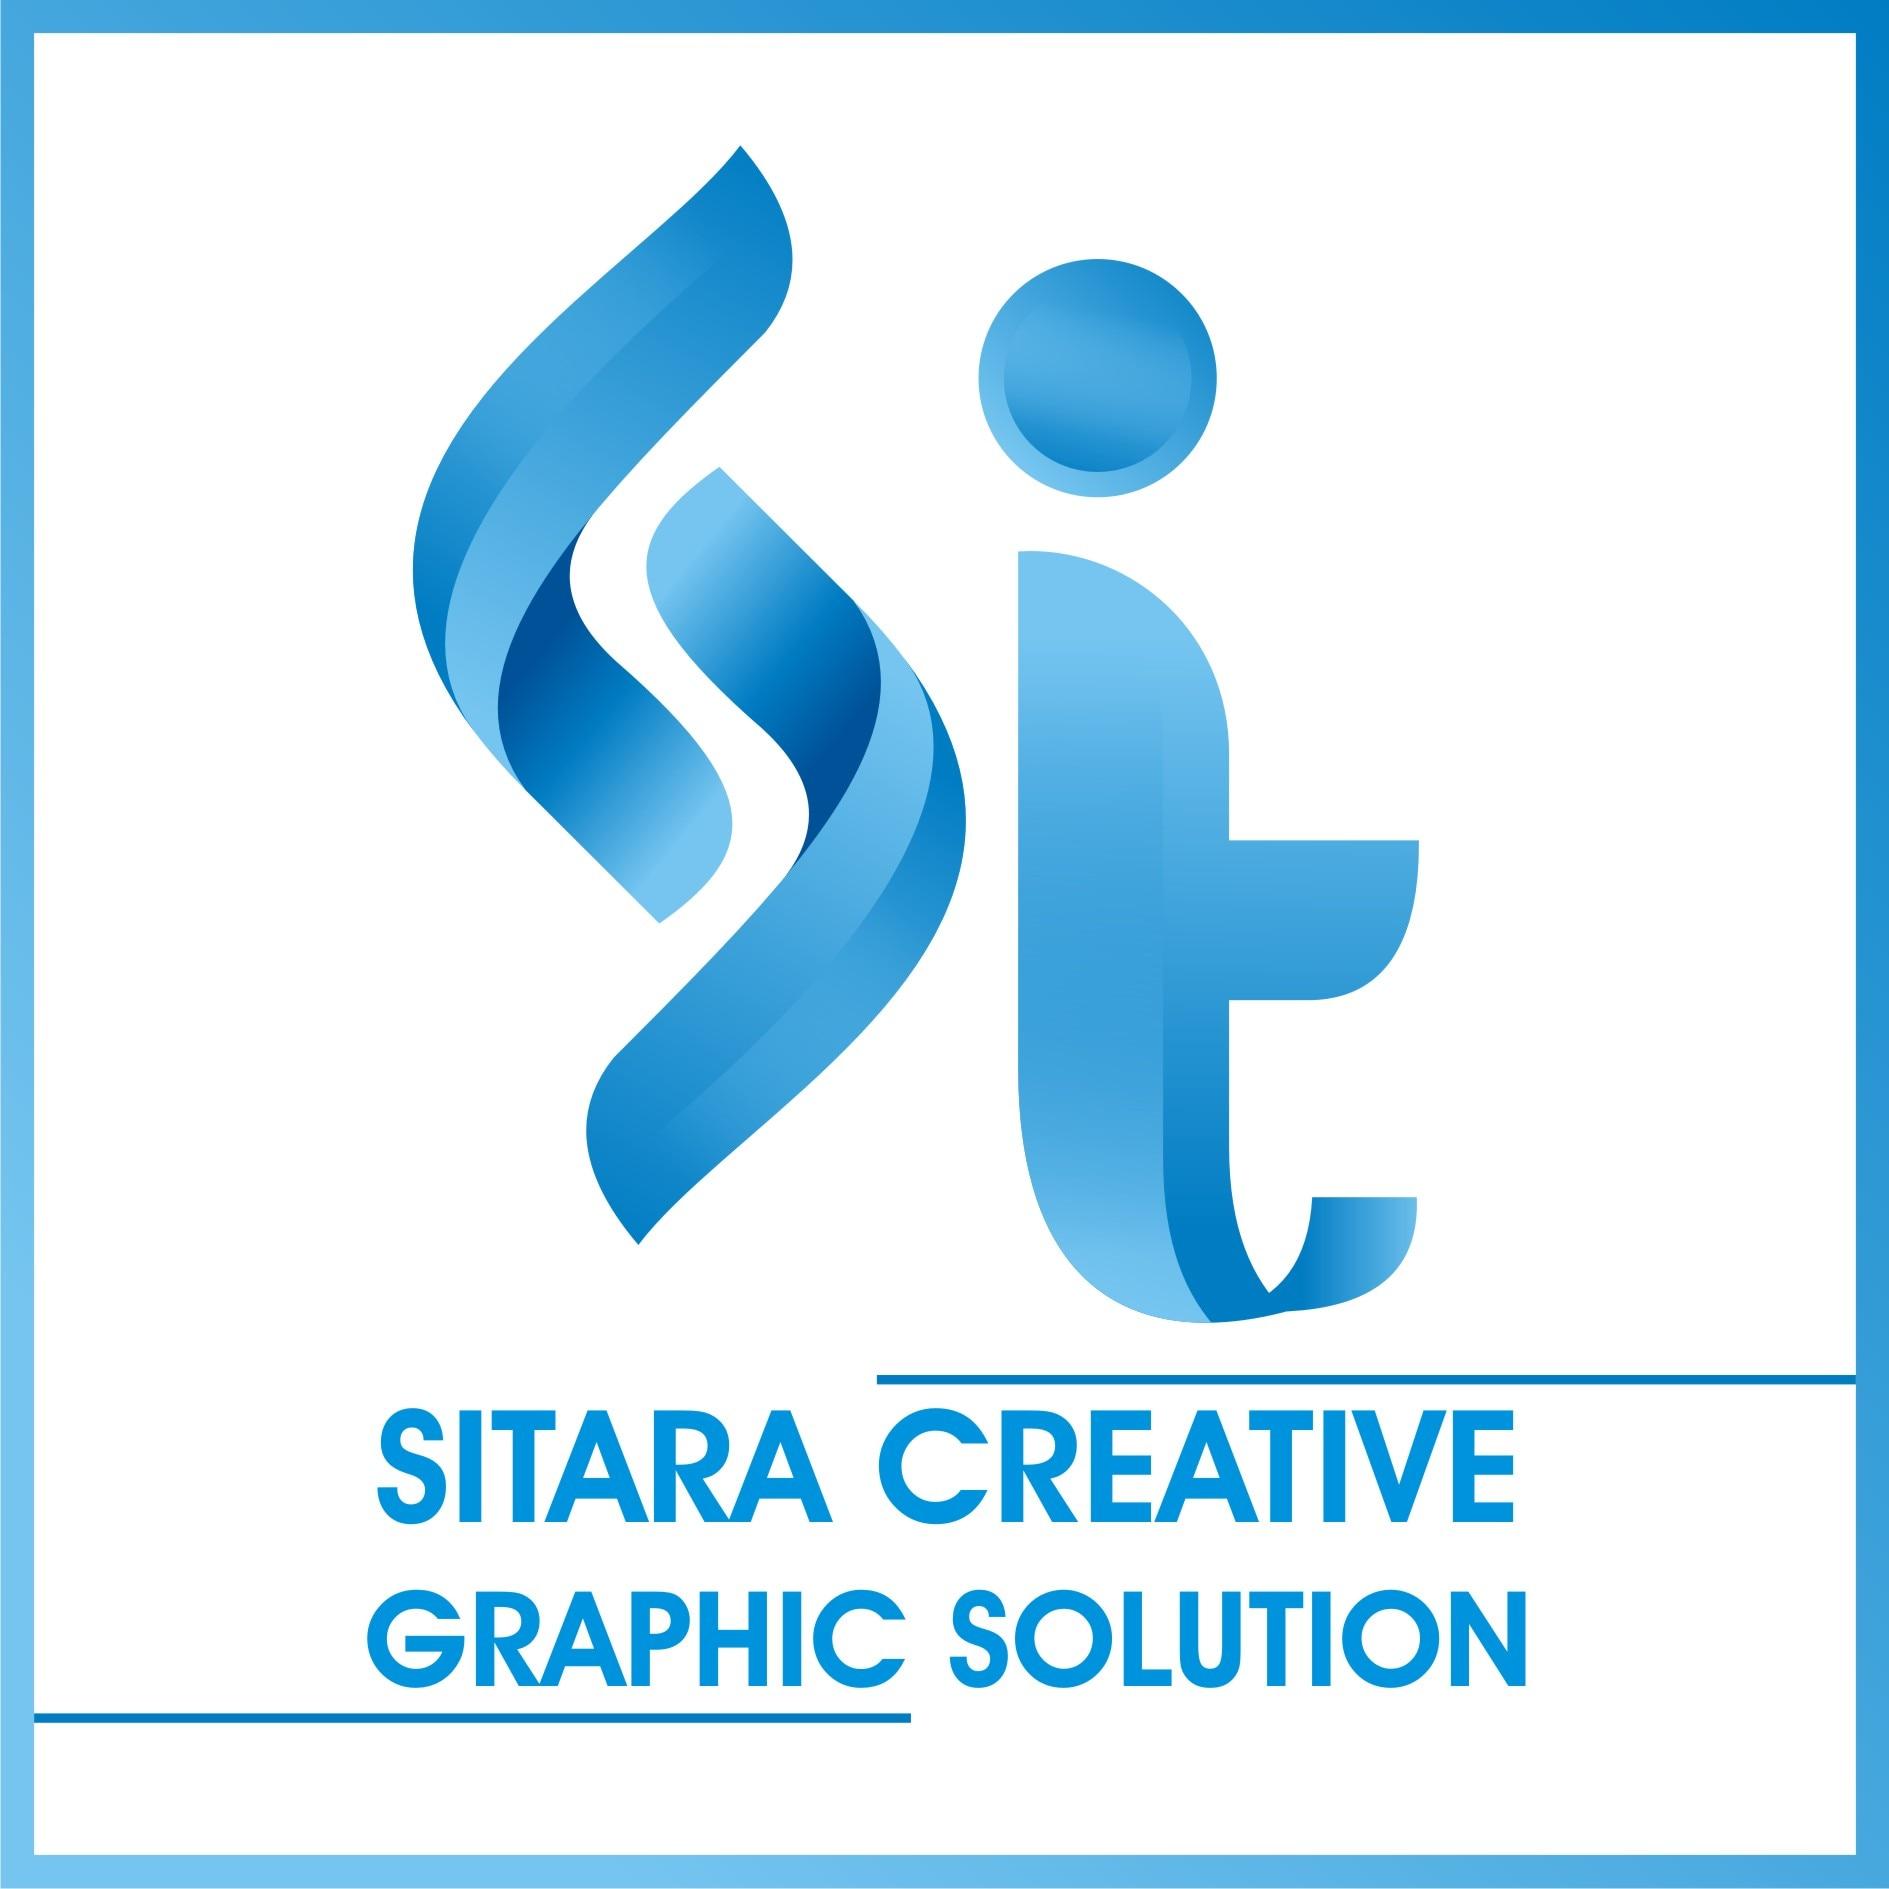 Sitara Creative Graphic Solution